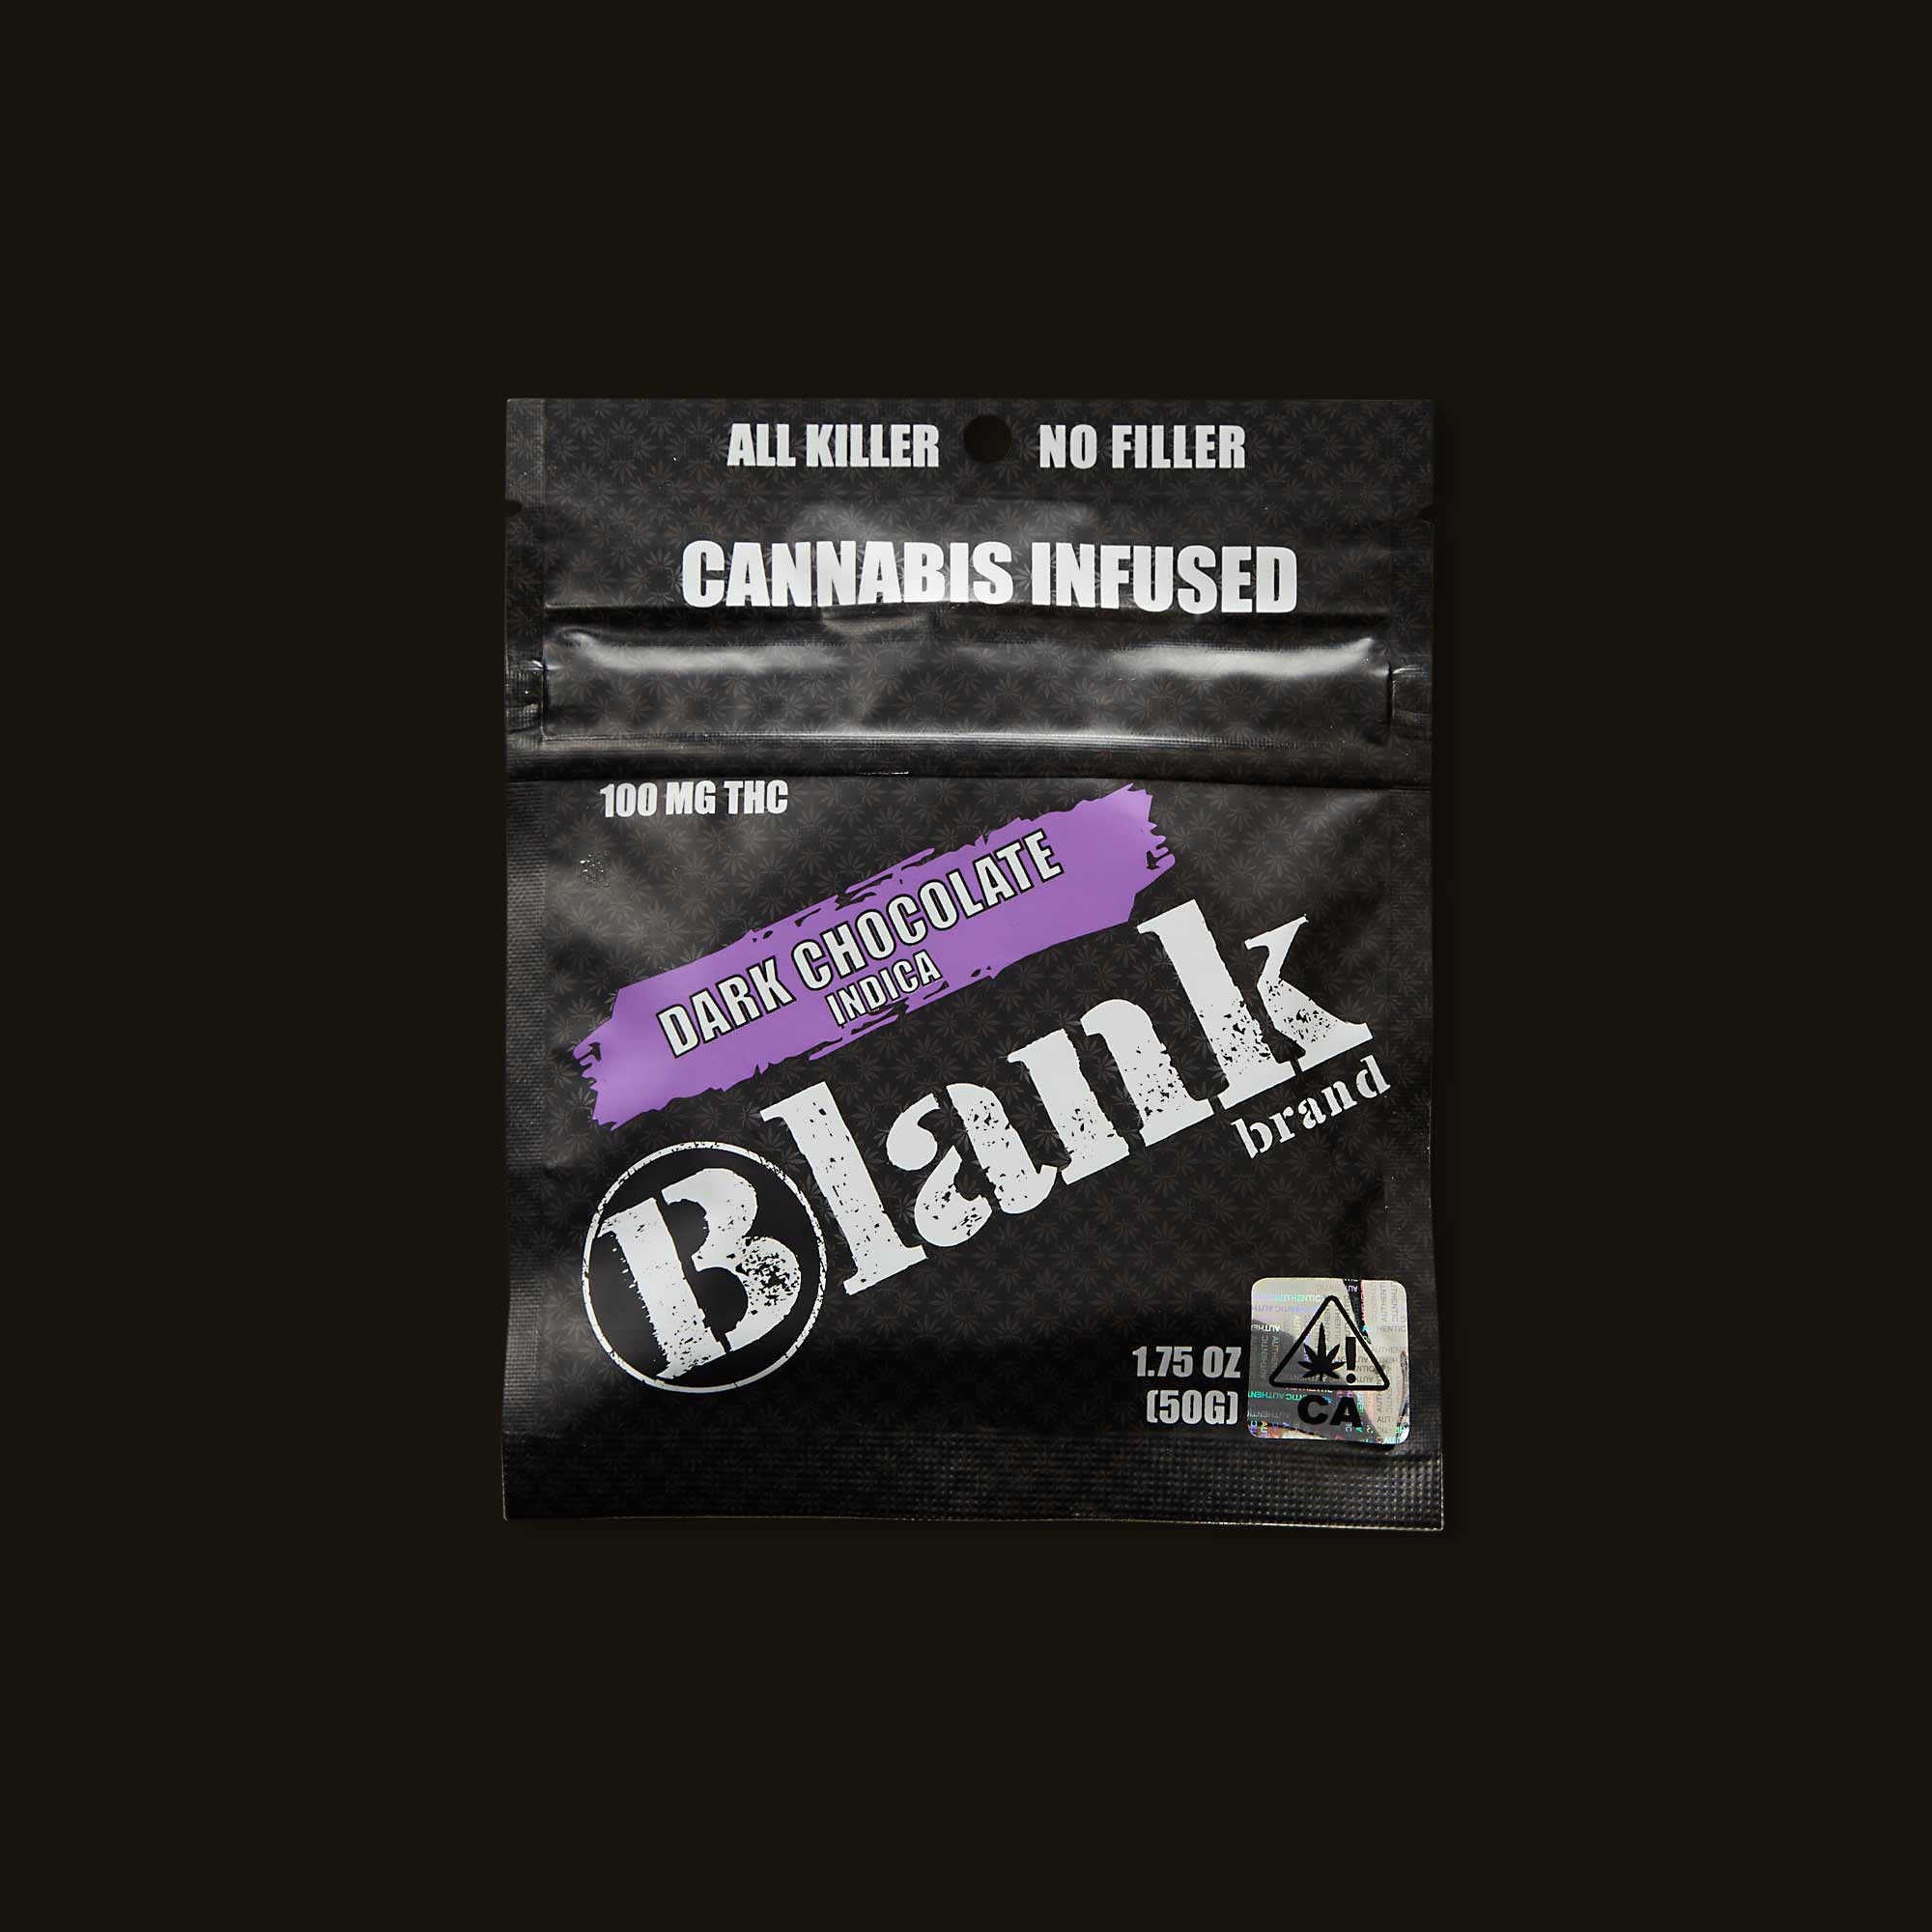 Blank Brand Indica Dark Chocolate